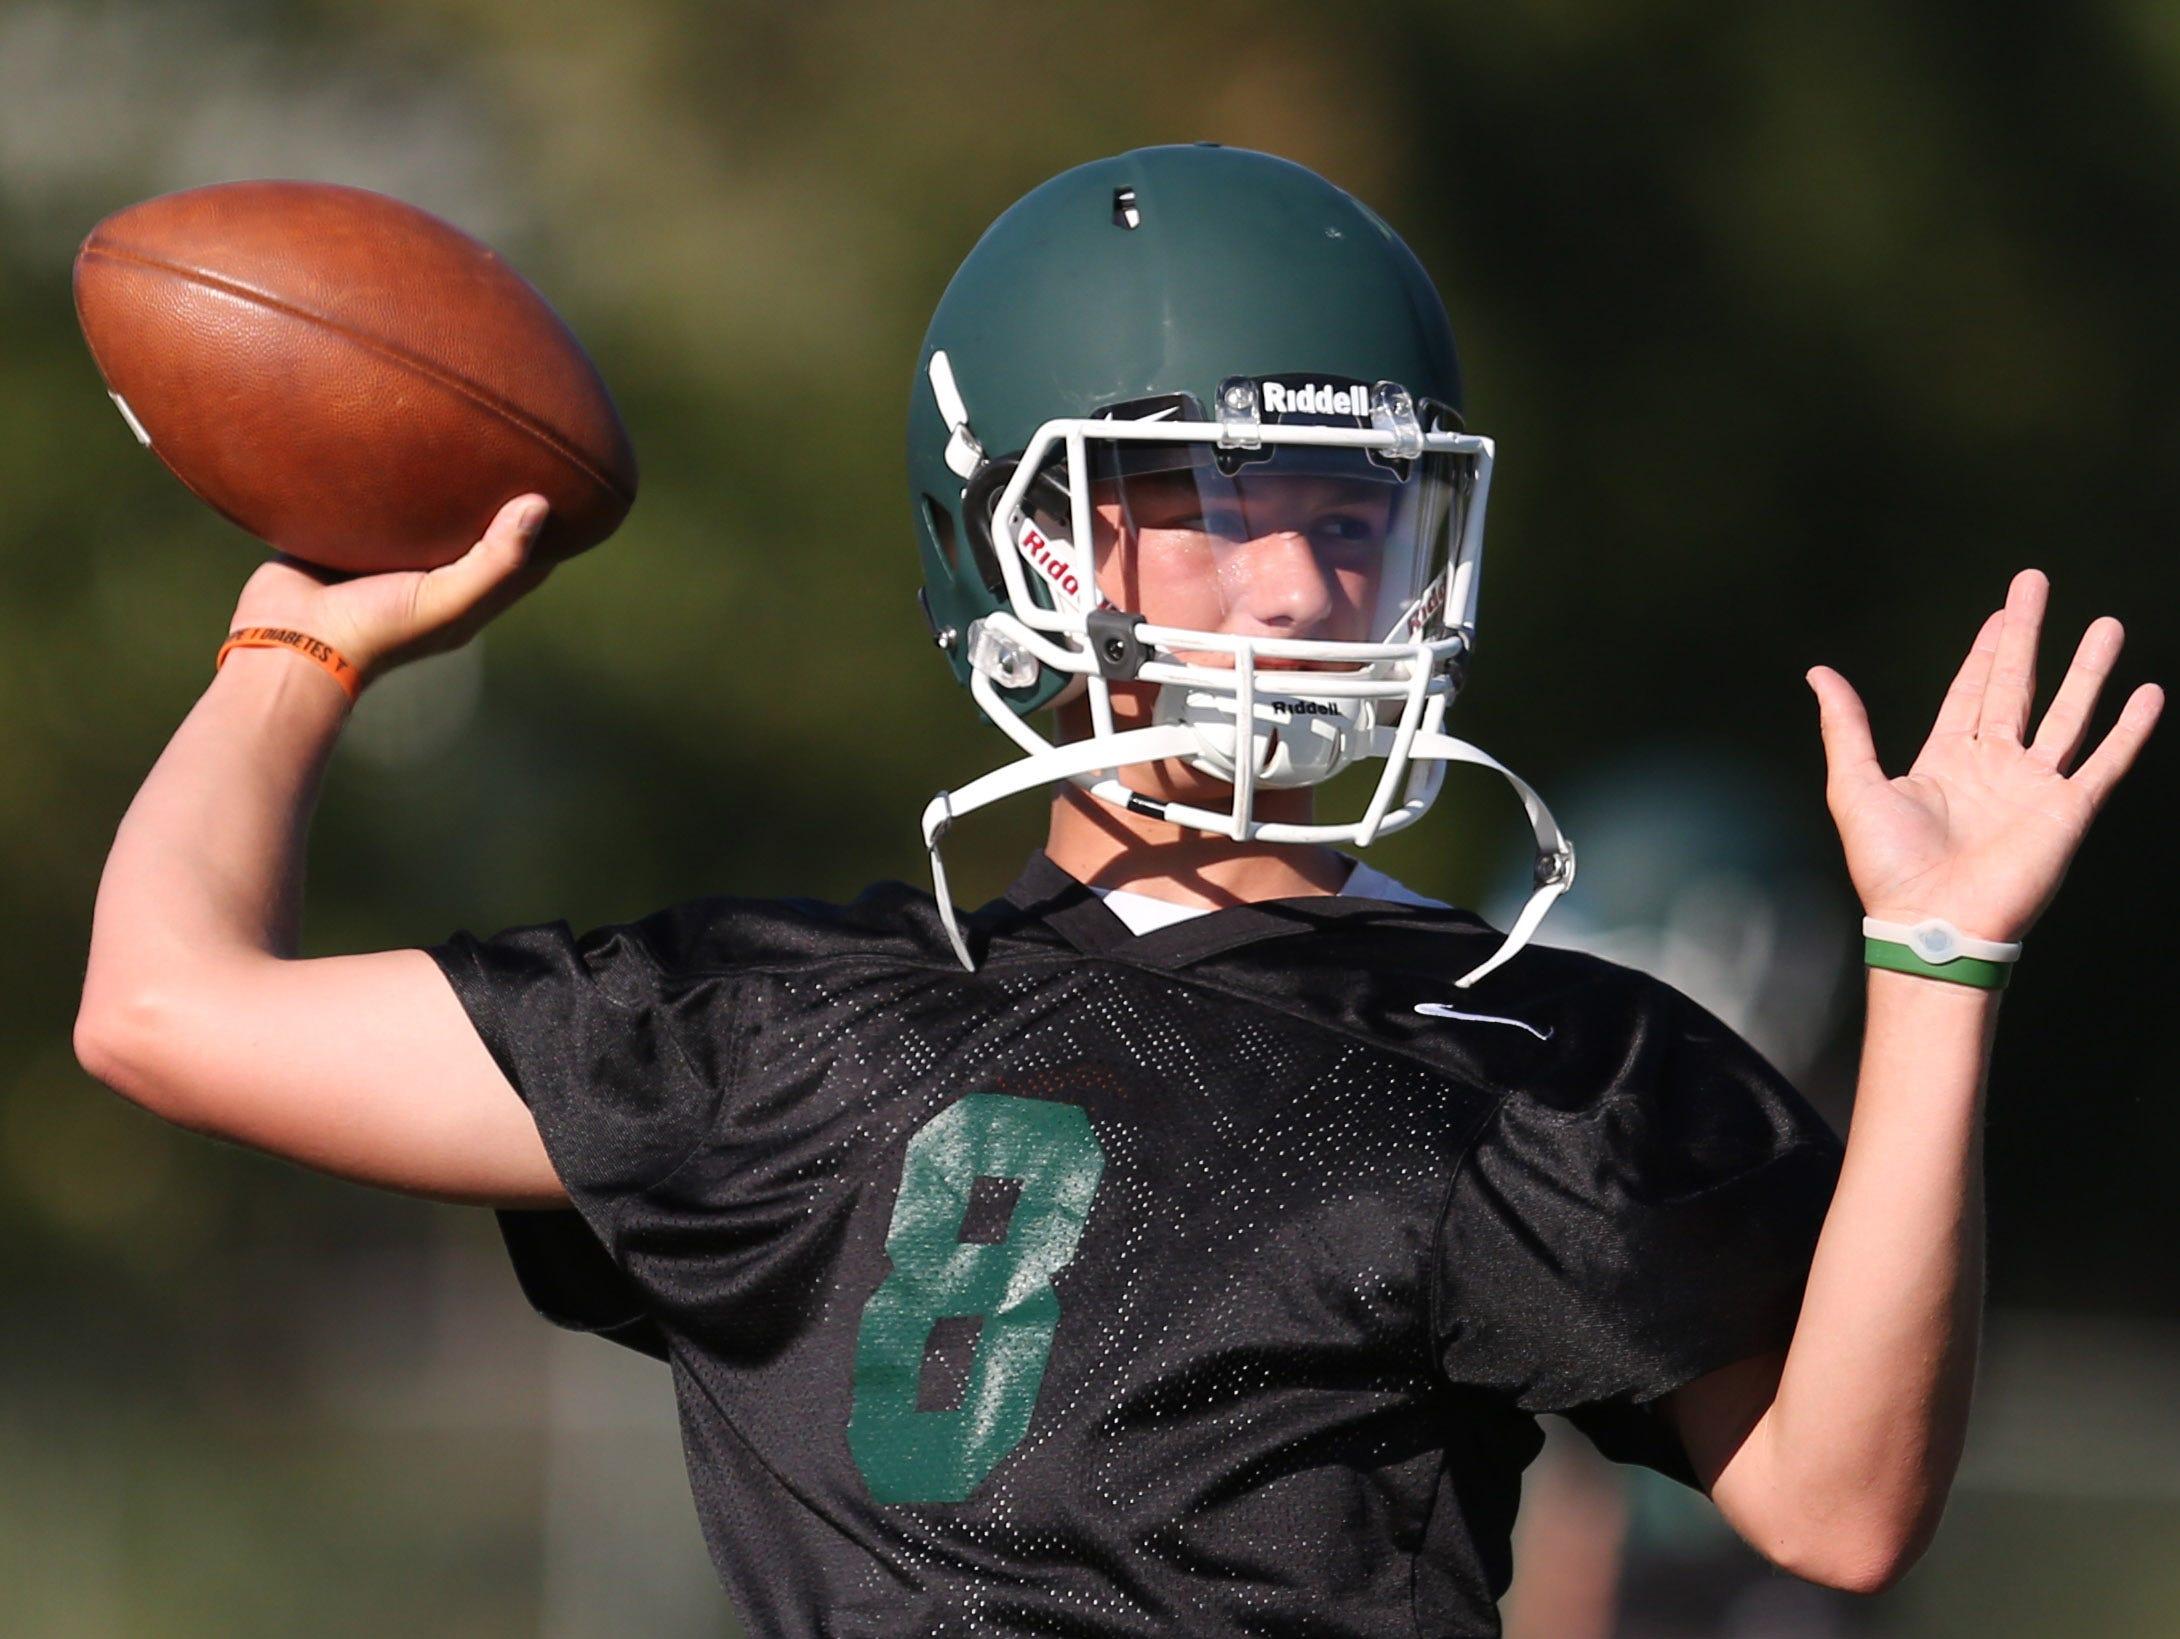 Senior quarterback Colton Daniels during practice on Wednesday, Aug. 16, 2016, at Salem Academy.